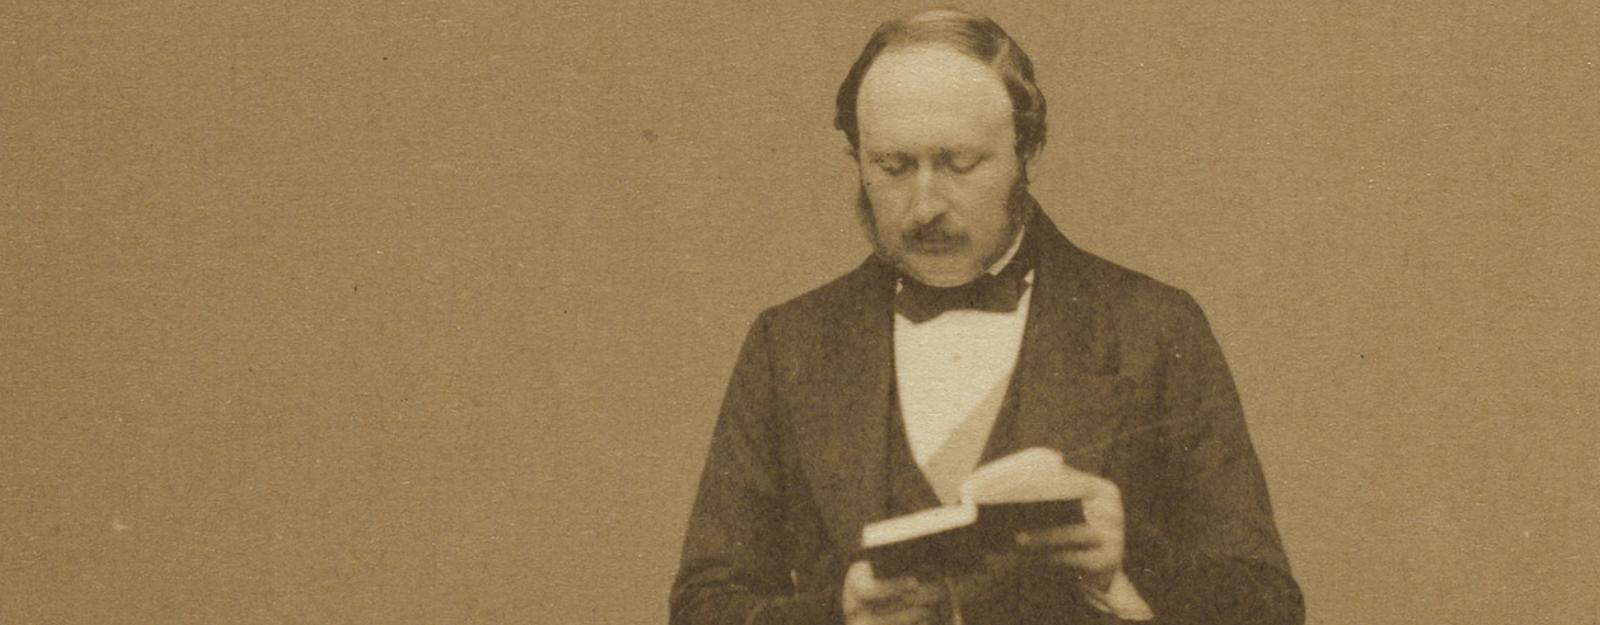 Photograph of Prince Albert reading